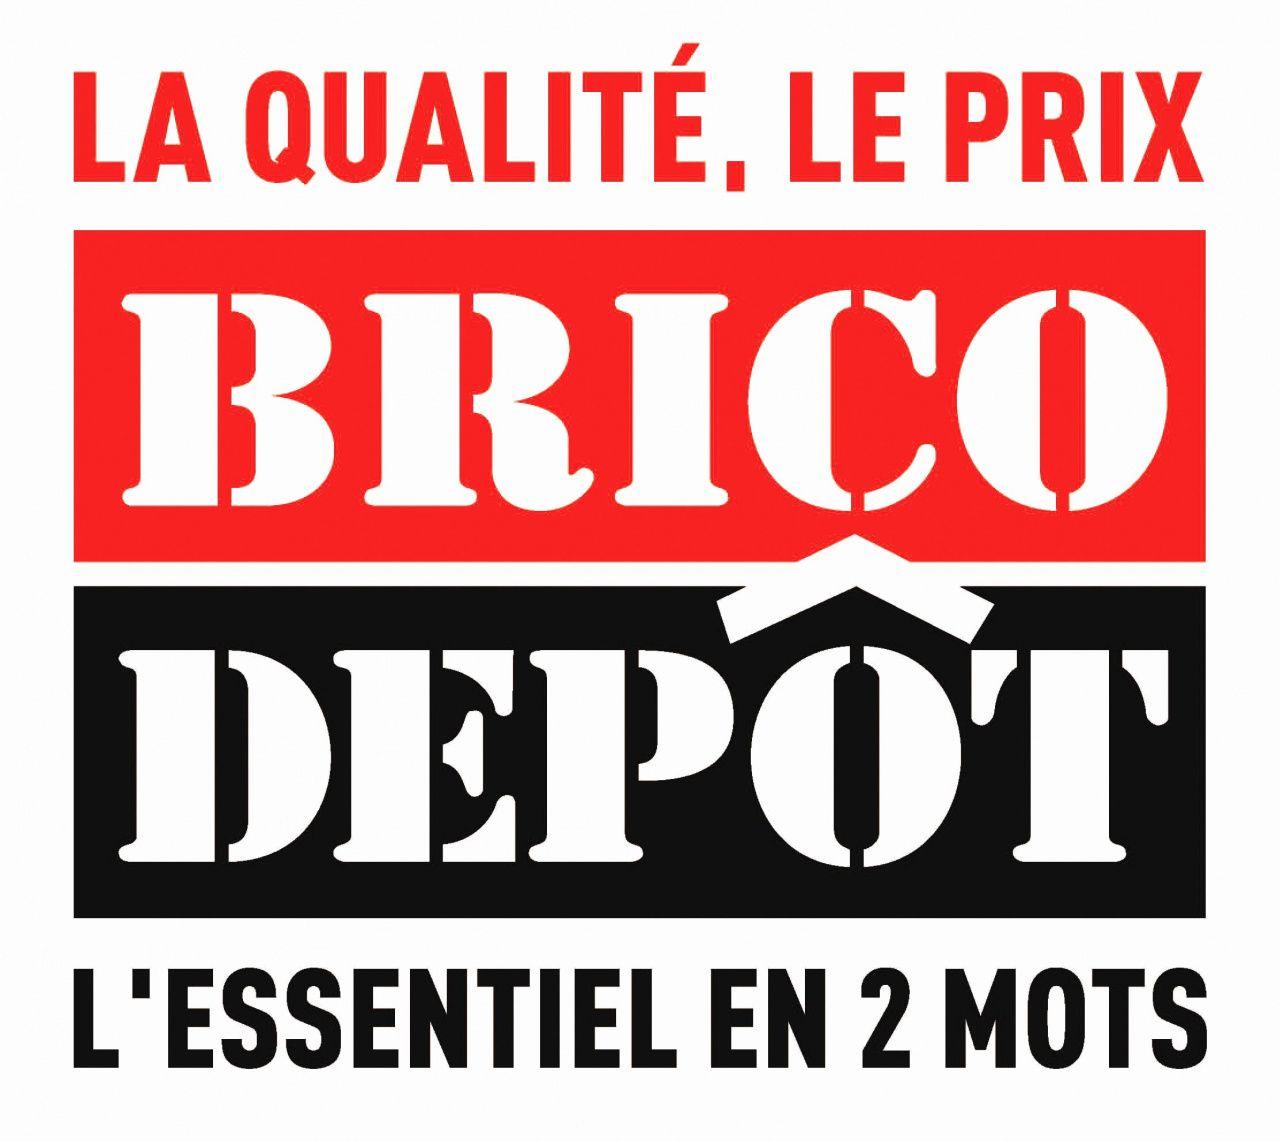 77 Nuancier Peinture Brico Depot Cuisine Design In 2019